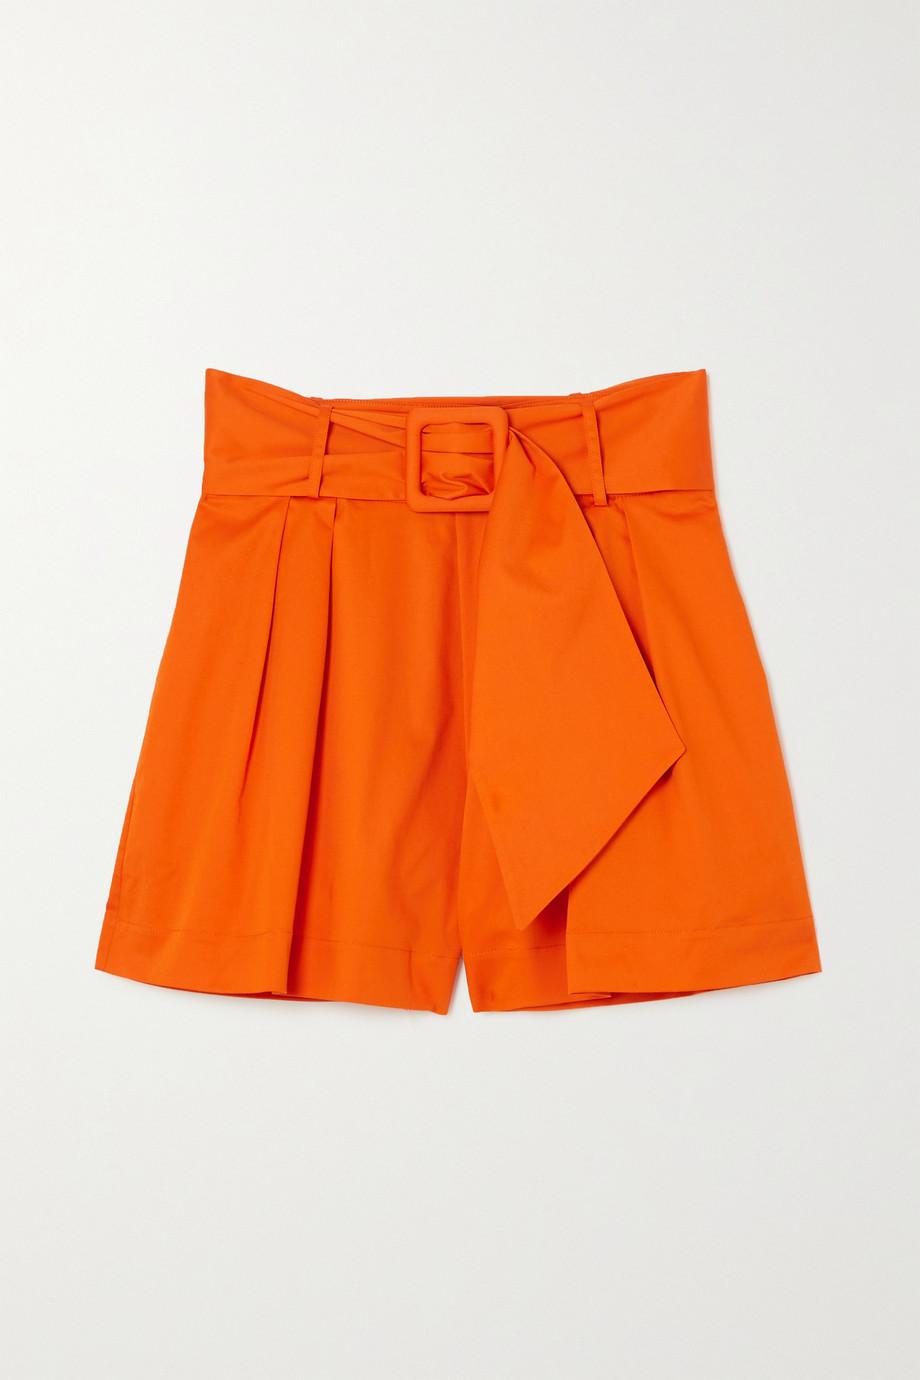 Oscar de la Renta Belted pleated stretch-cotton twill shorts